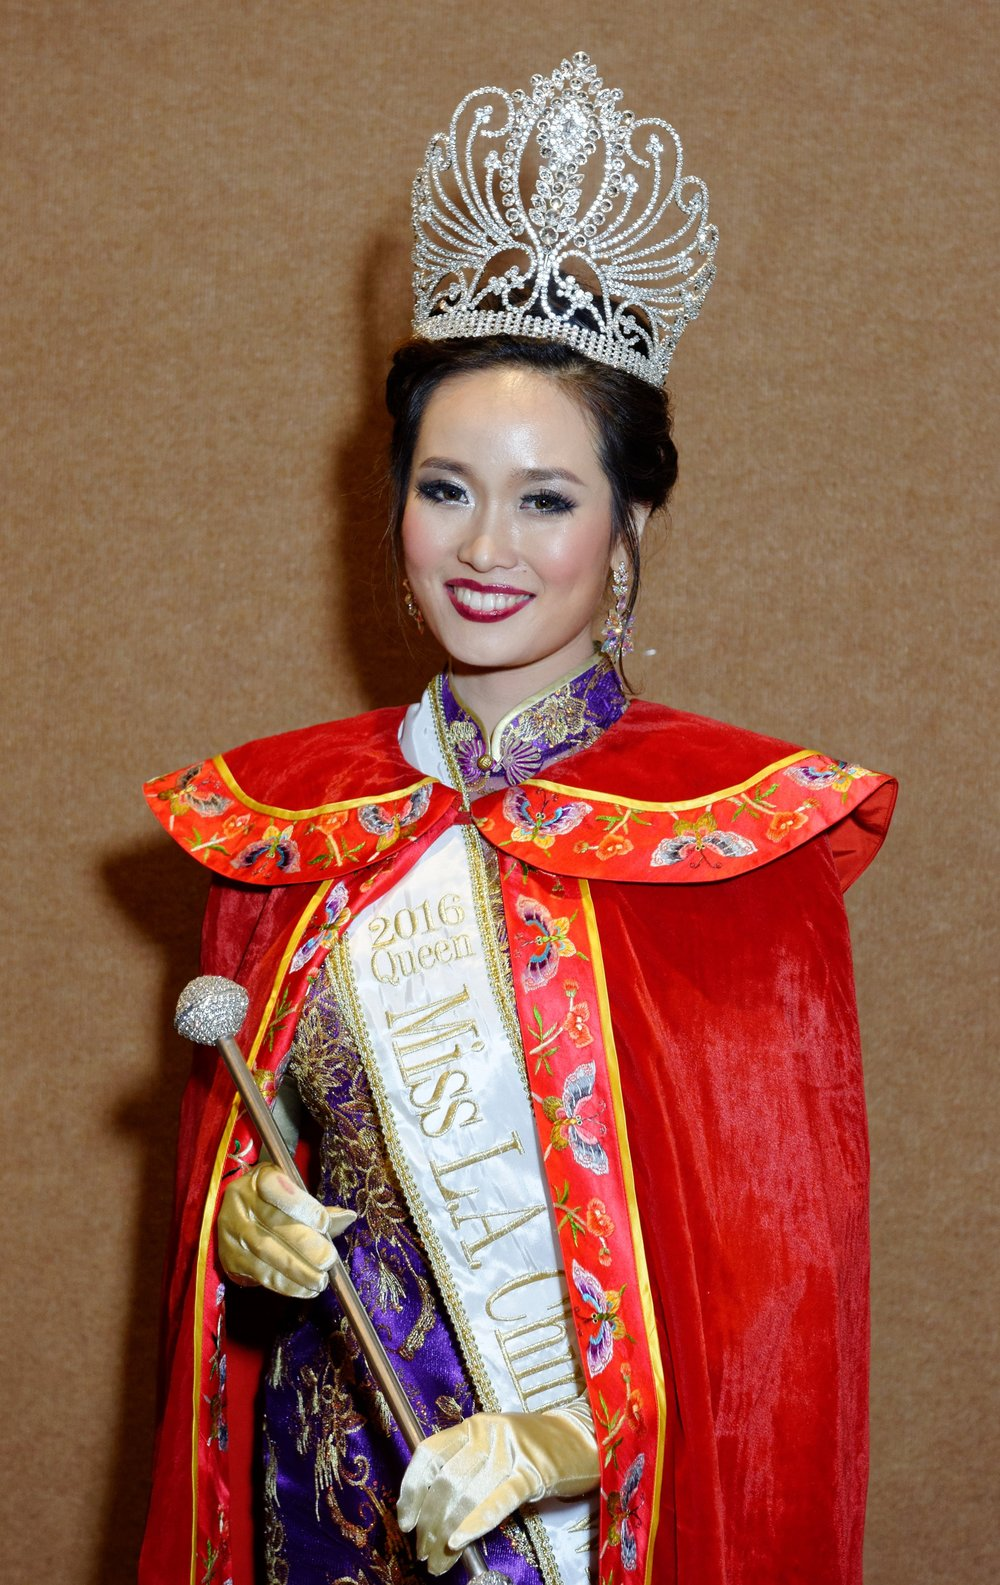 Queen & Miss Photogenic, Li Qu